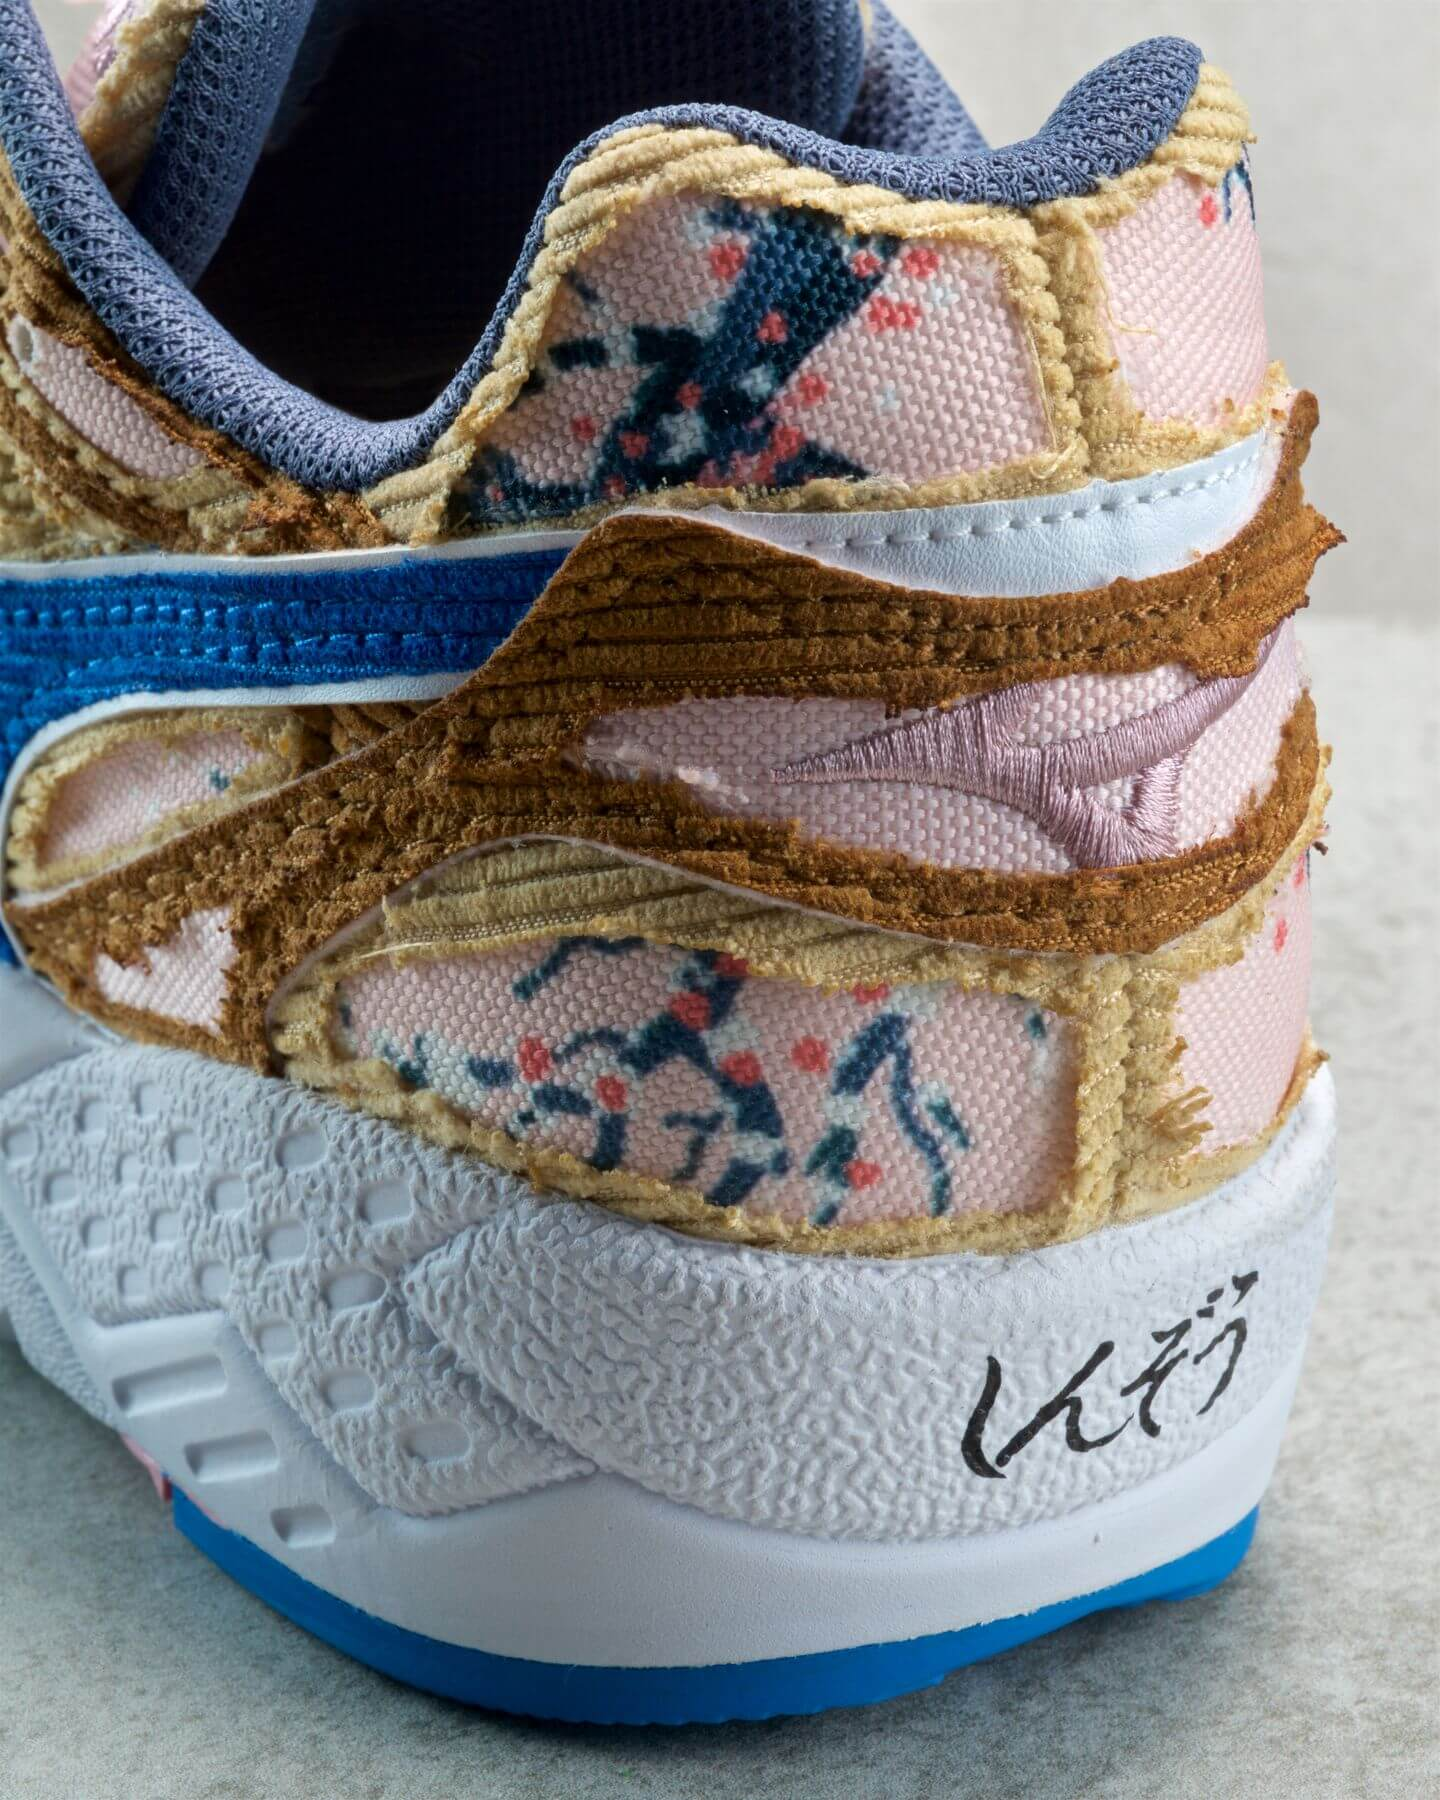 heel logo detail shinzo - Mizuno x Shinzo Paris - Contender - brown/blue - cherry blossom